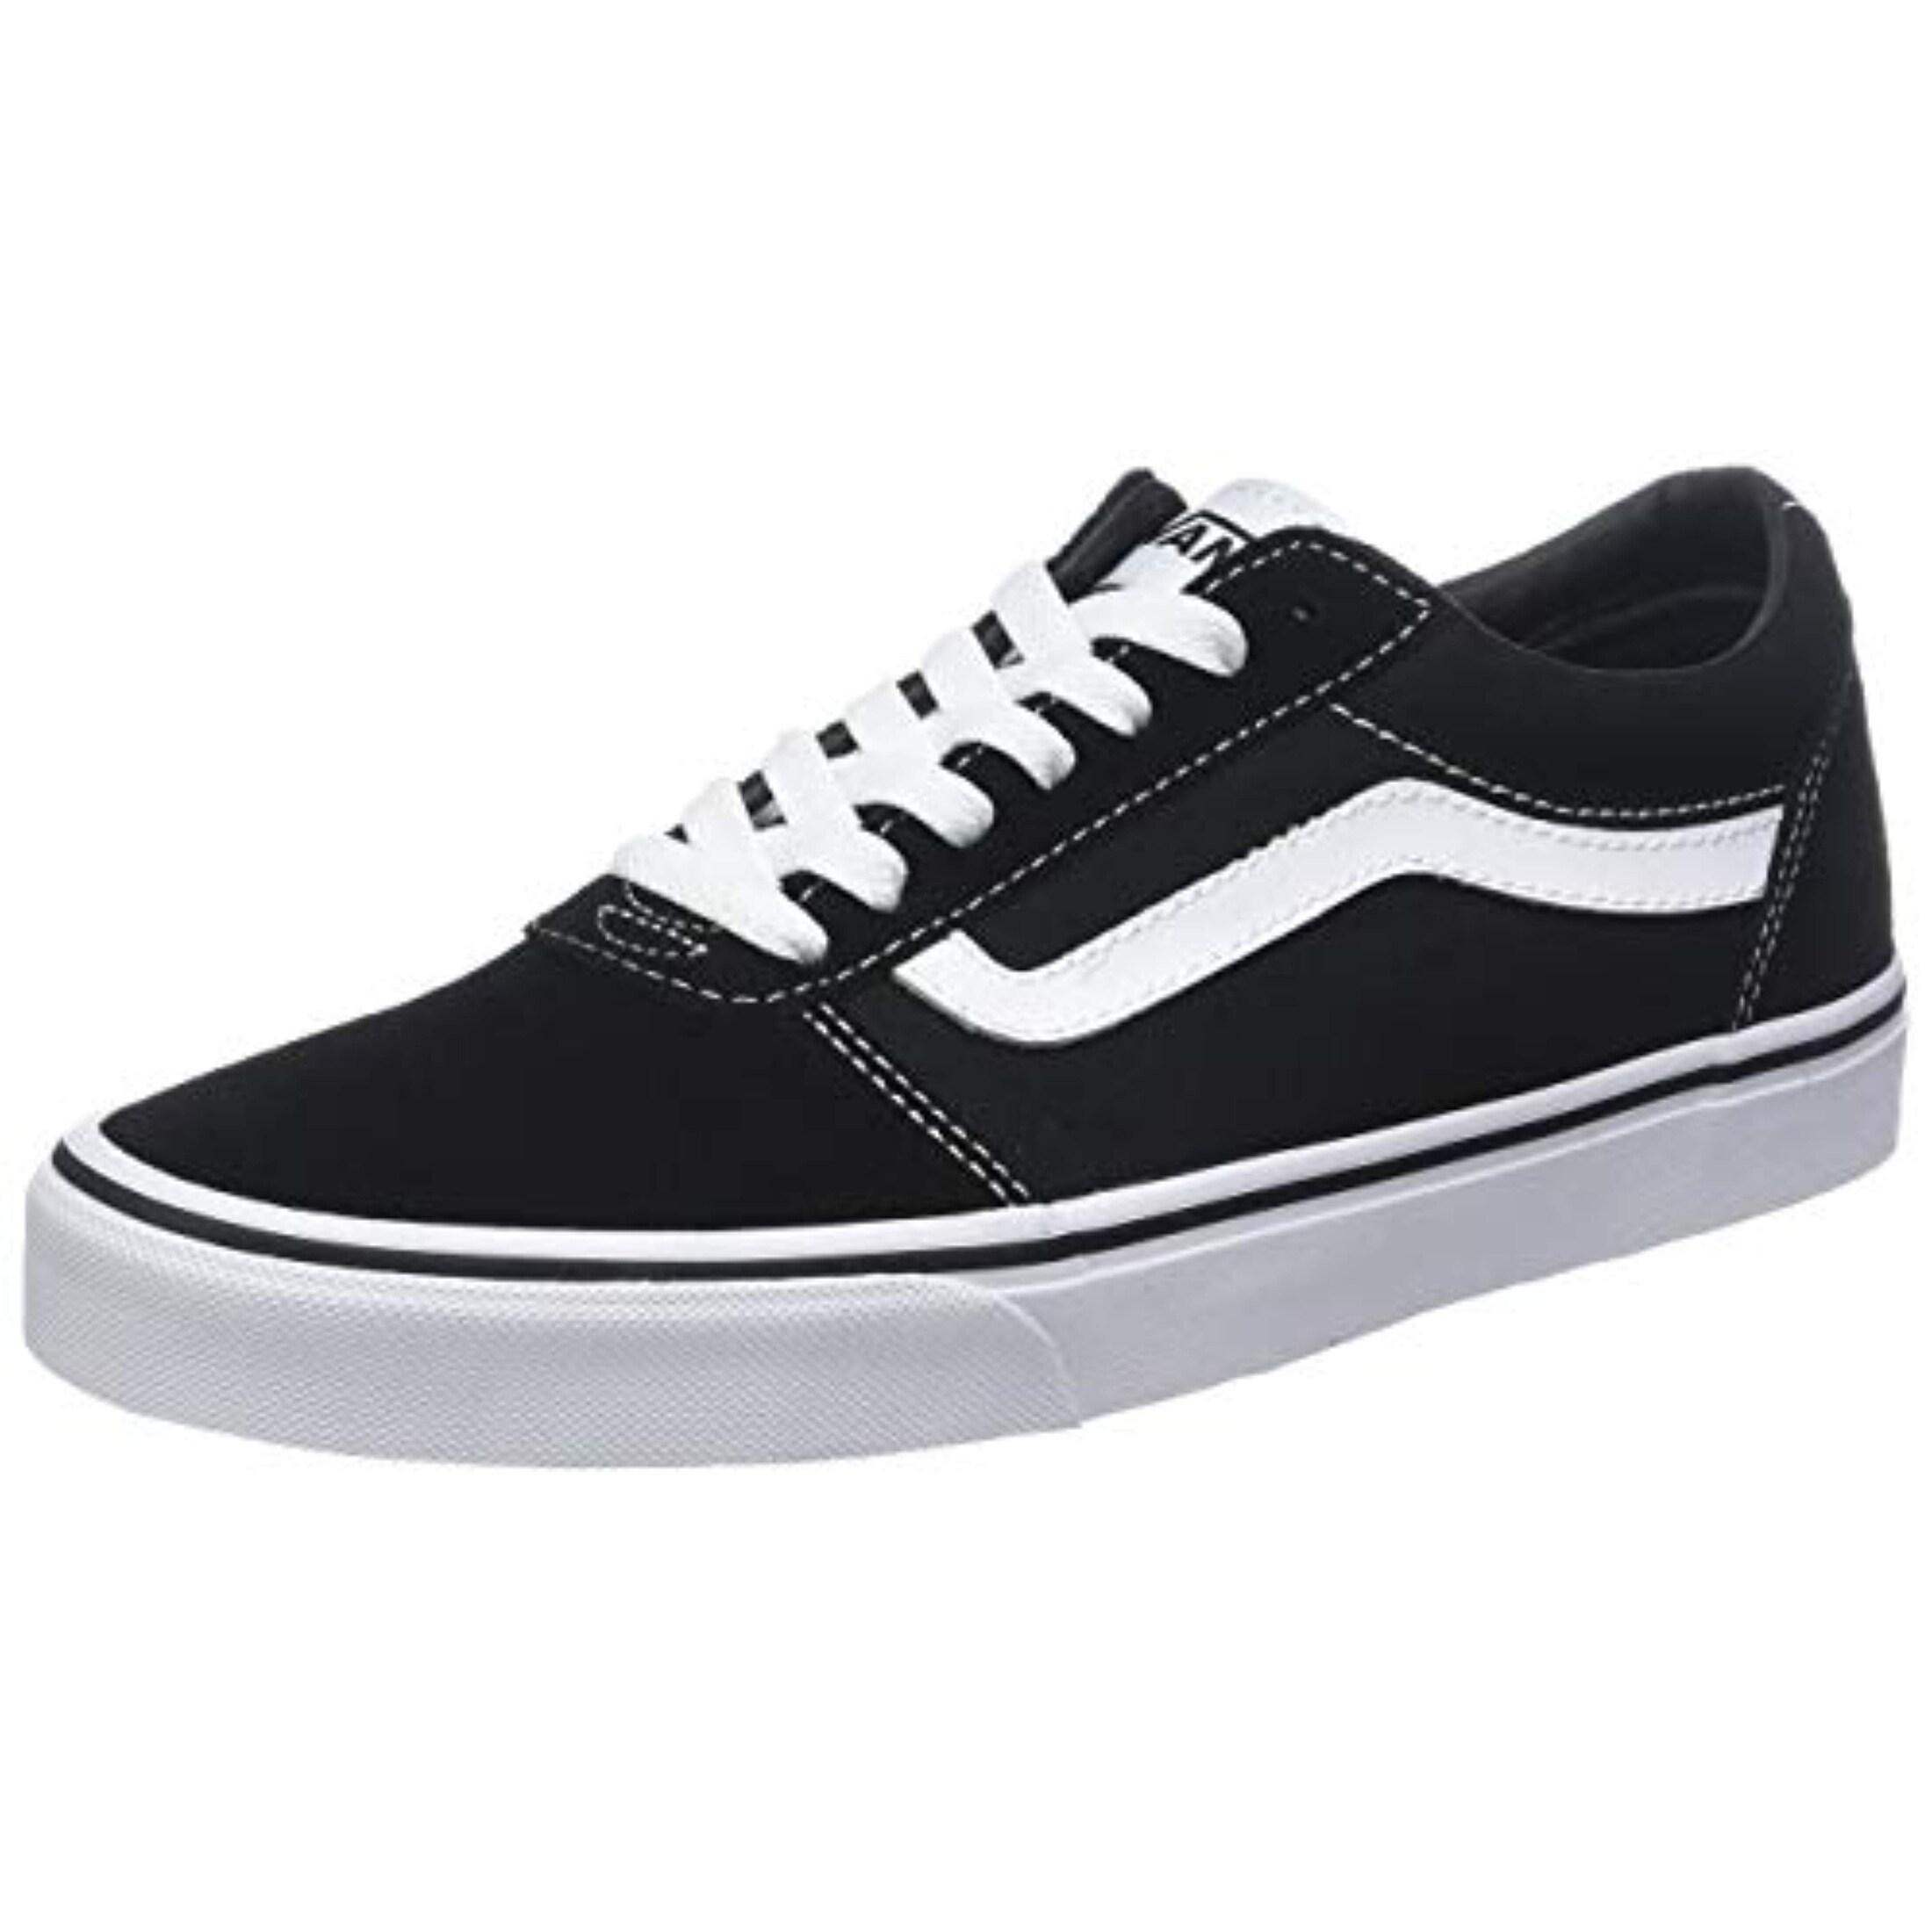 Sneakers, Black ((Suede/Canvas) Black